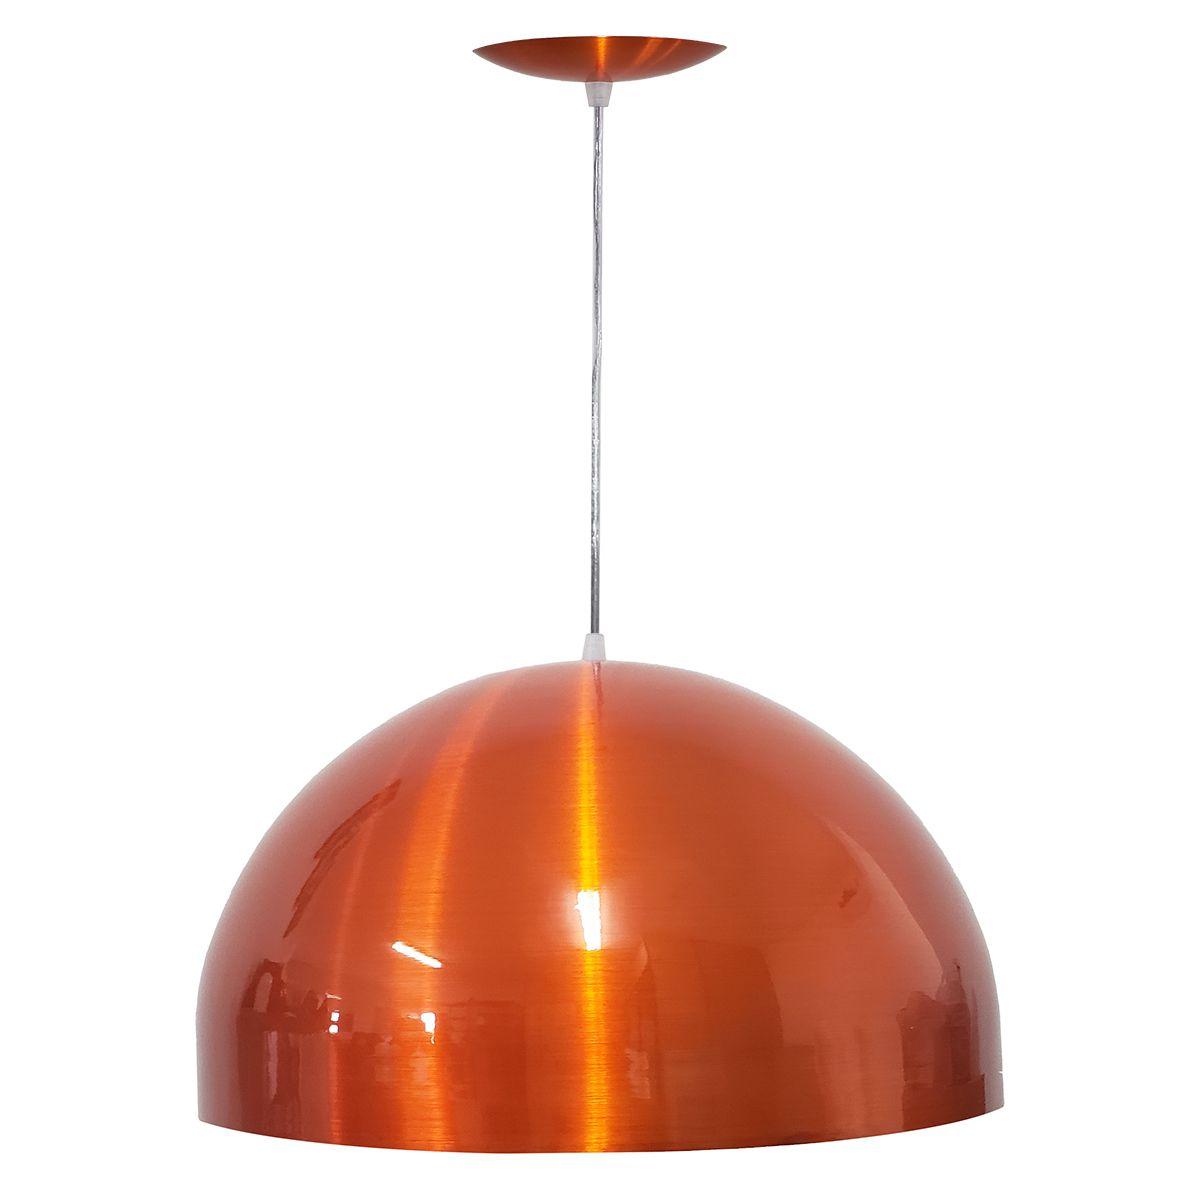 Luminária Decorativa Meia Esfera 40 Laranja Cobre Pendente